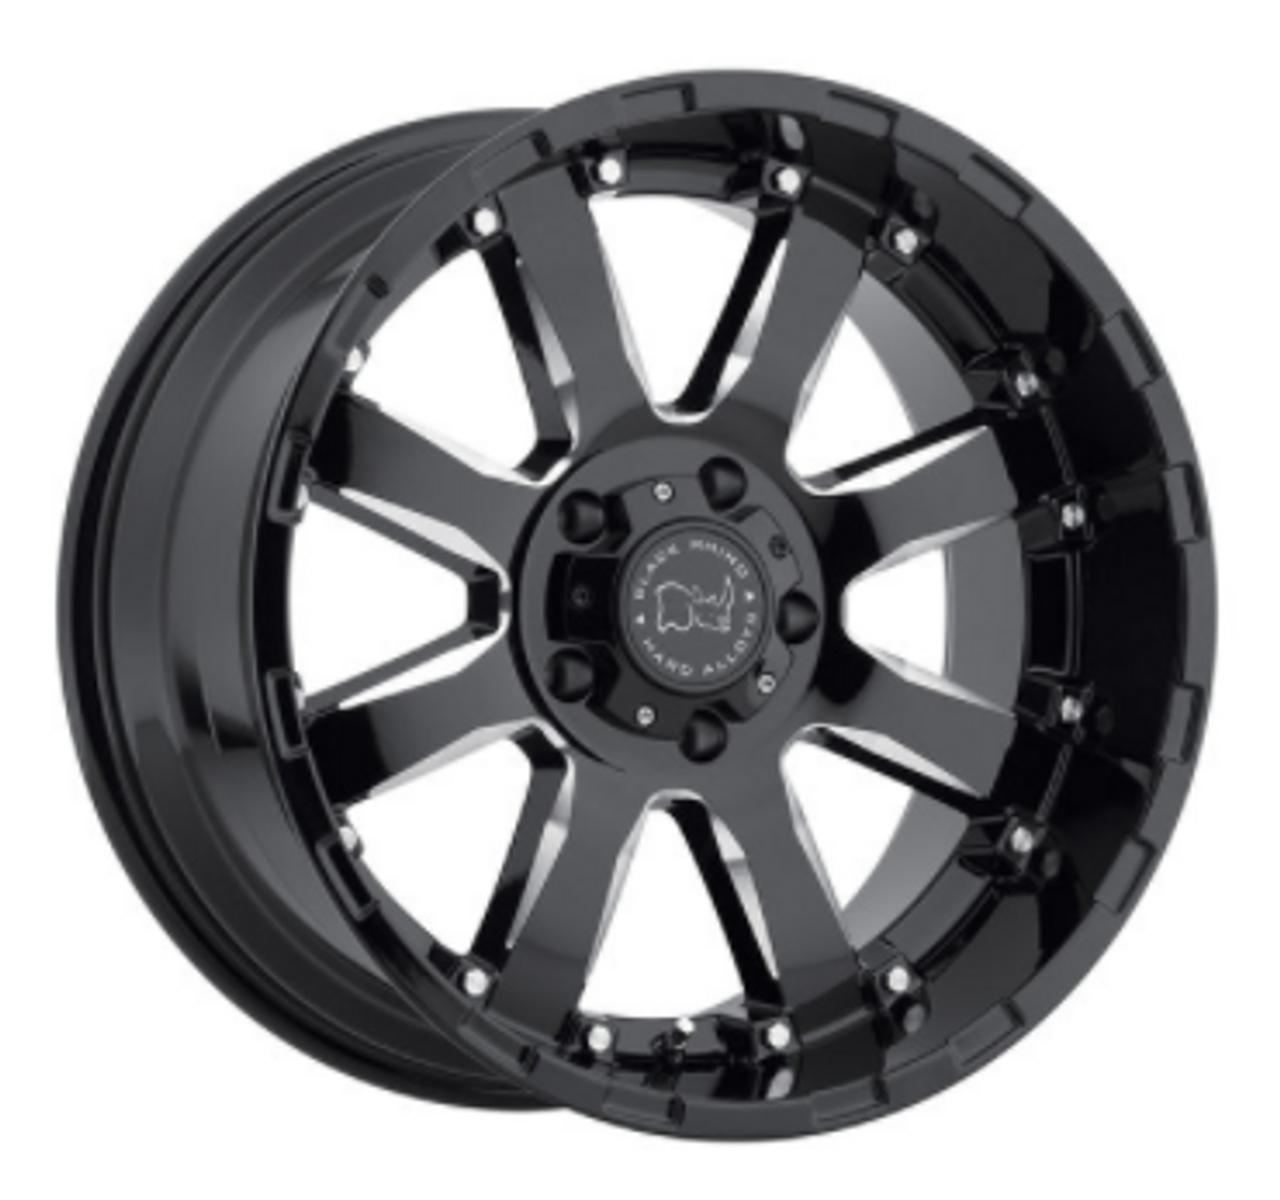 Black Rhino 1790SRA-25127B78 Sierra Wheel | 17x9 | 5x5 | Gloss Black with Milled Spokes